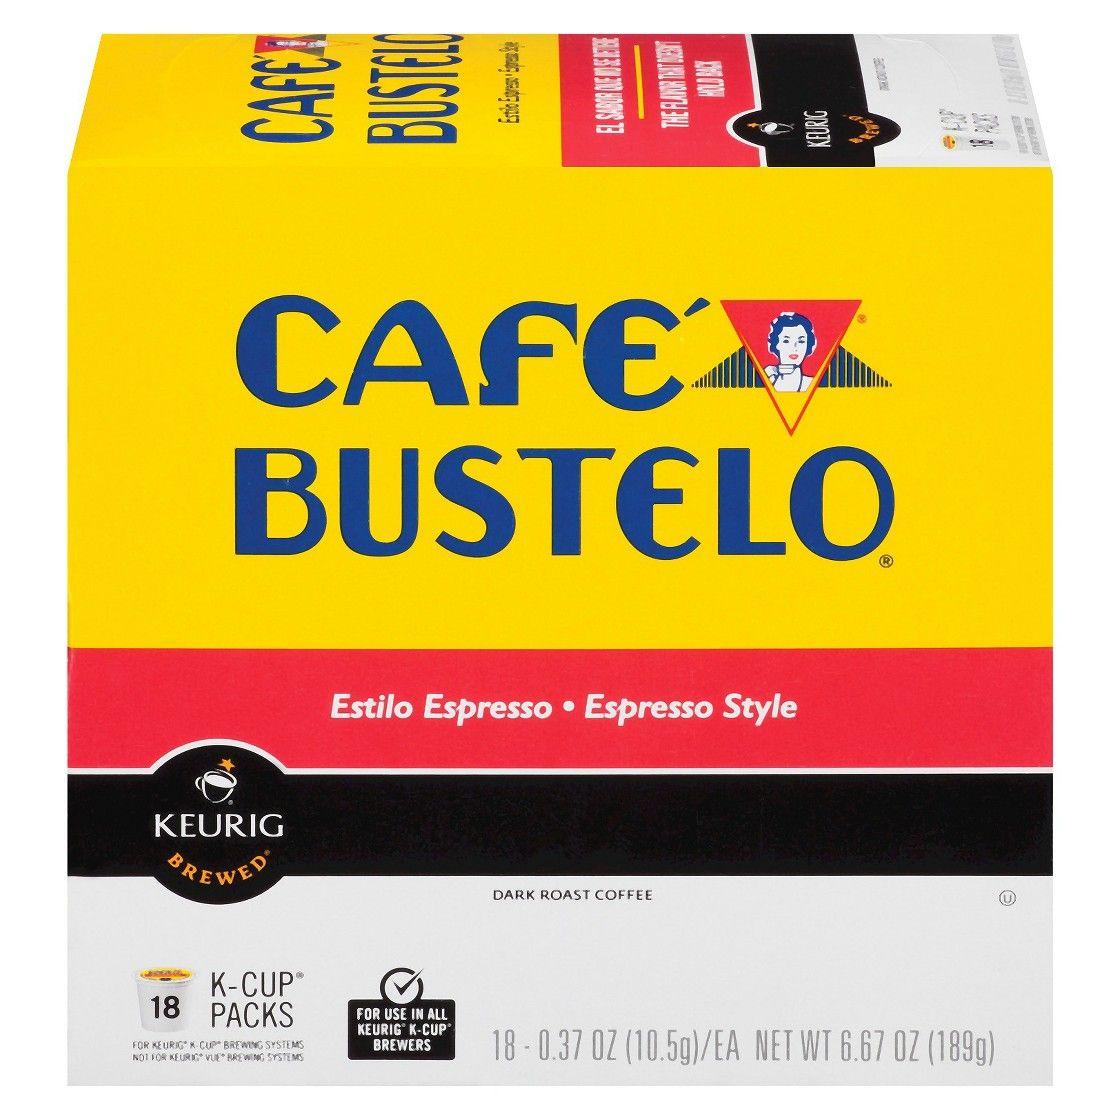 Cafe bustelo espresso kcup 18 ct cafe bustelo coffee